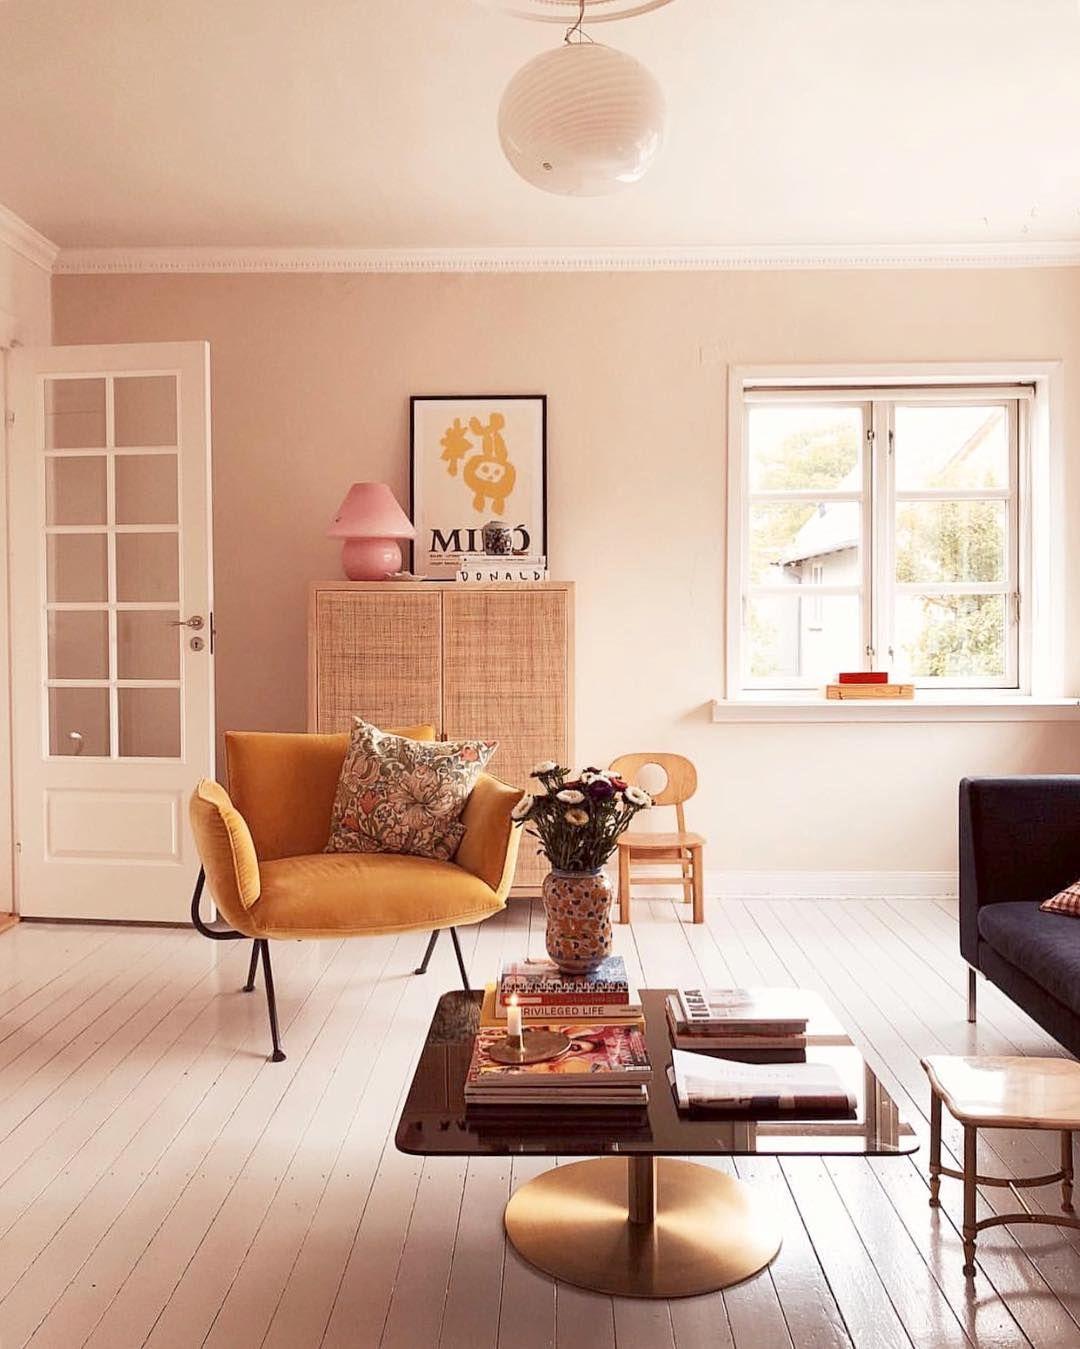 Lonny on instagram uca peek inside one of our favorite homes on